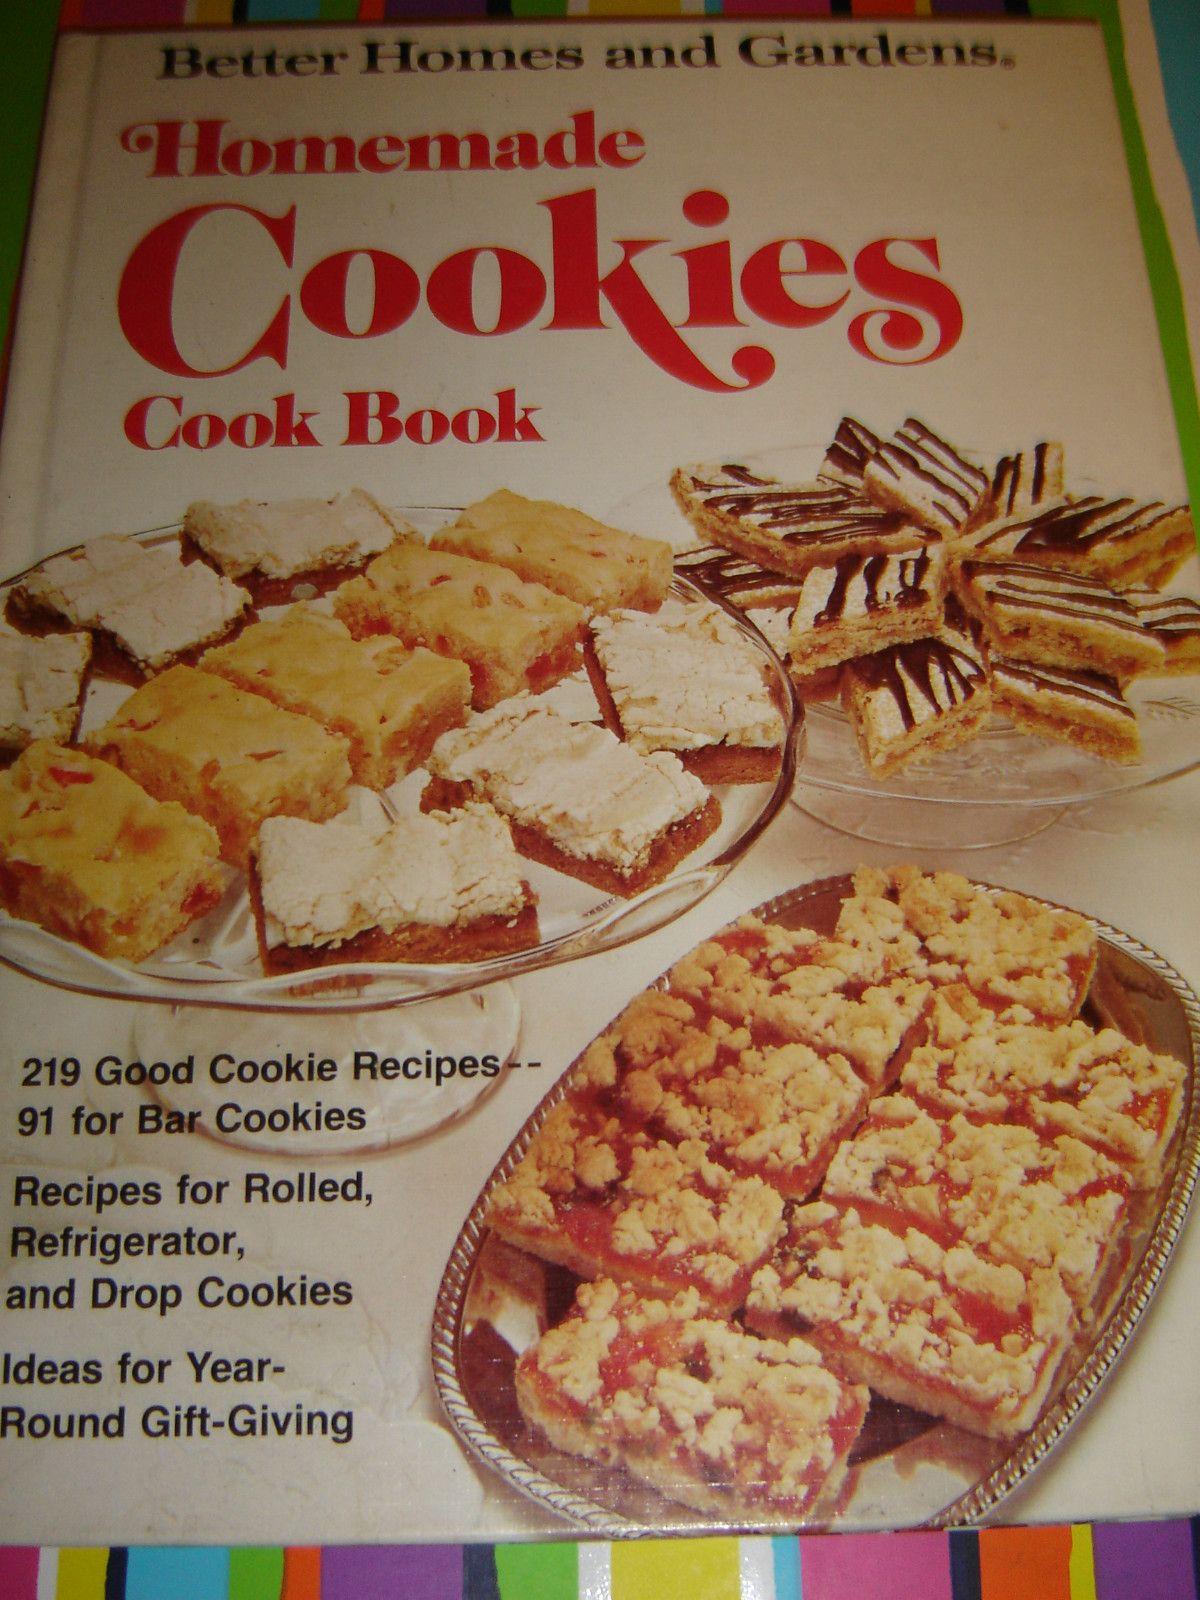 f0d095e7d02b761a13d8496f5a45ca7e - Better Homes And Gardens Cookbook 1975